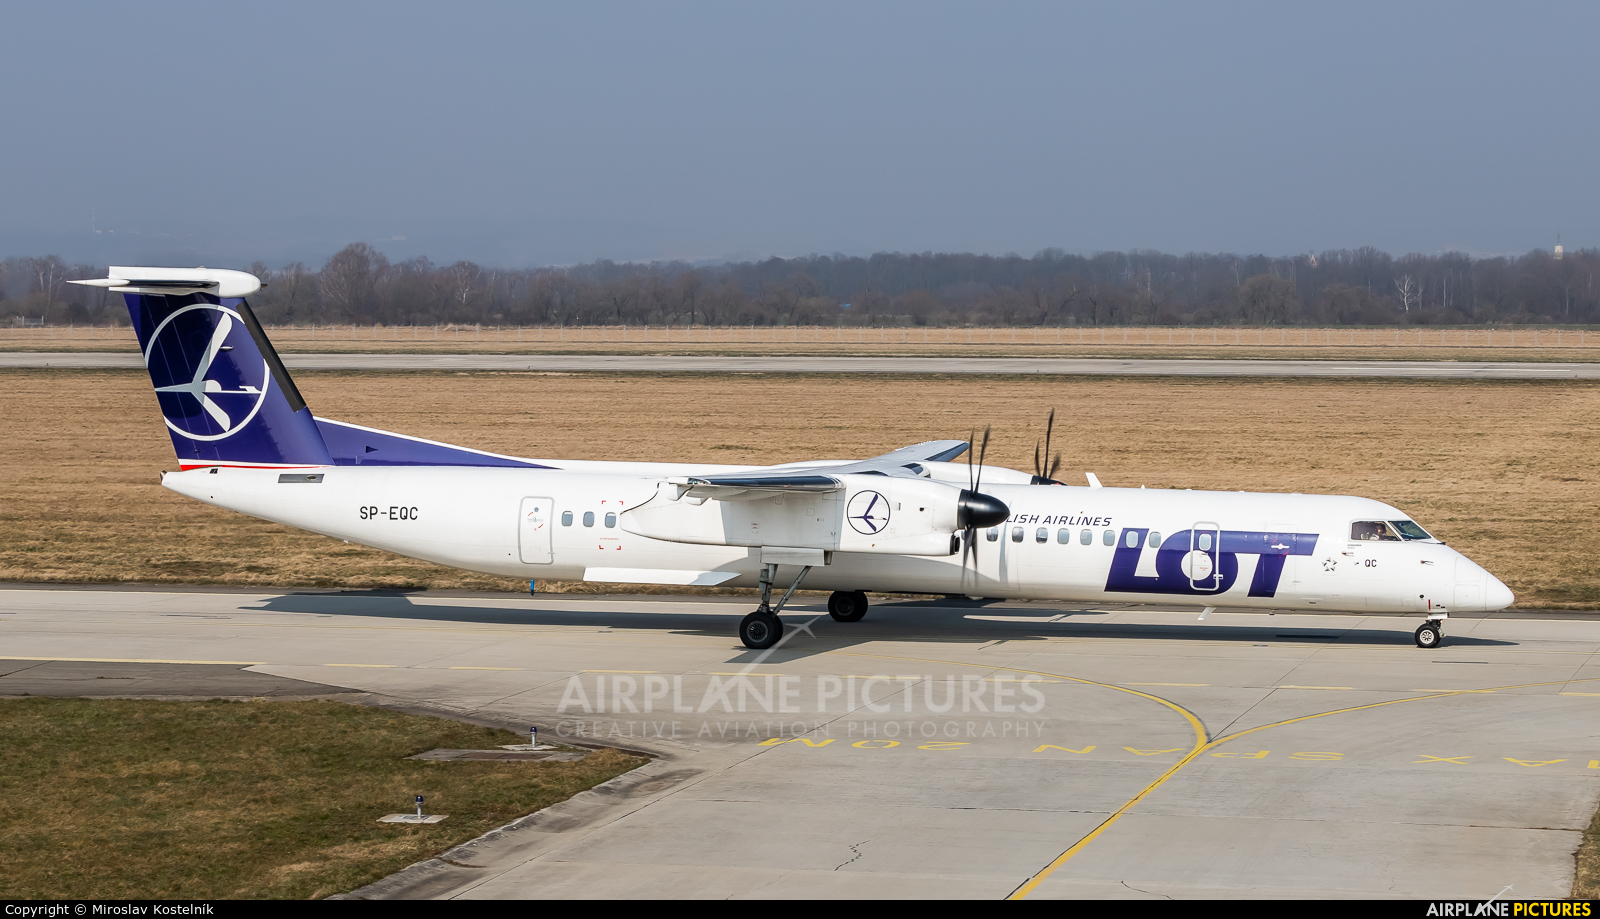 LOT - Polish Airlines SP-EQC aircraft at Ostrava Mošnov